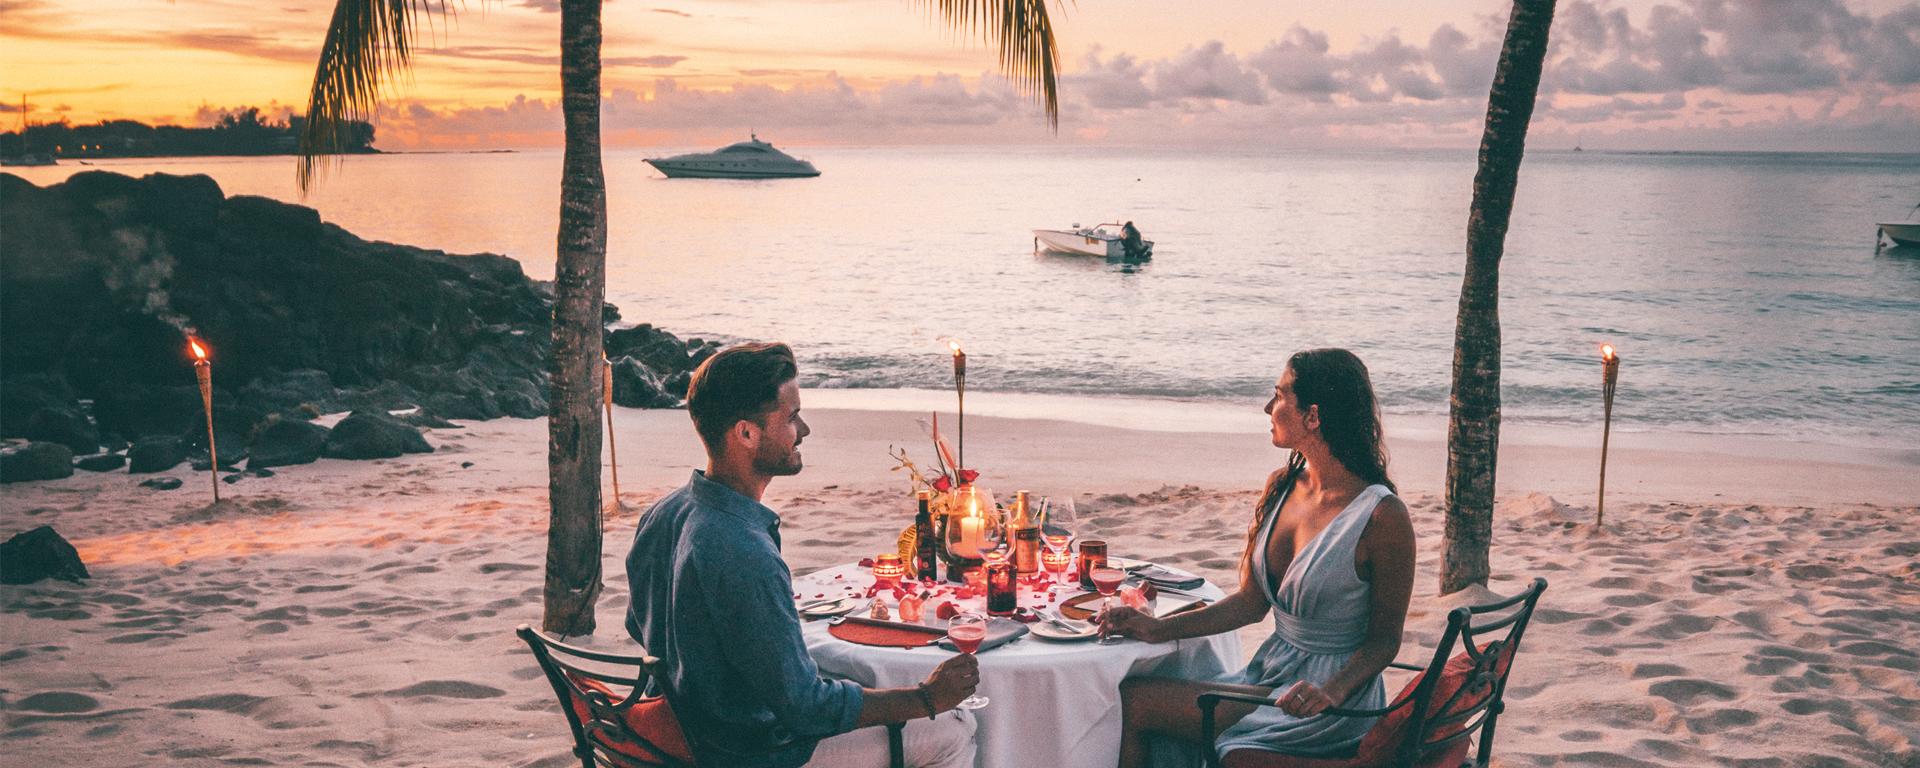 honeymoon royal palm beachcomber luxury